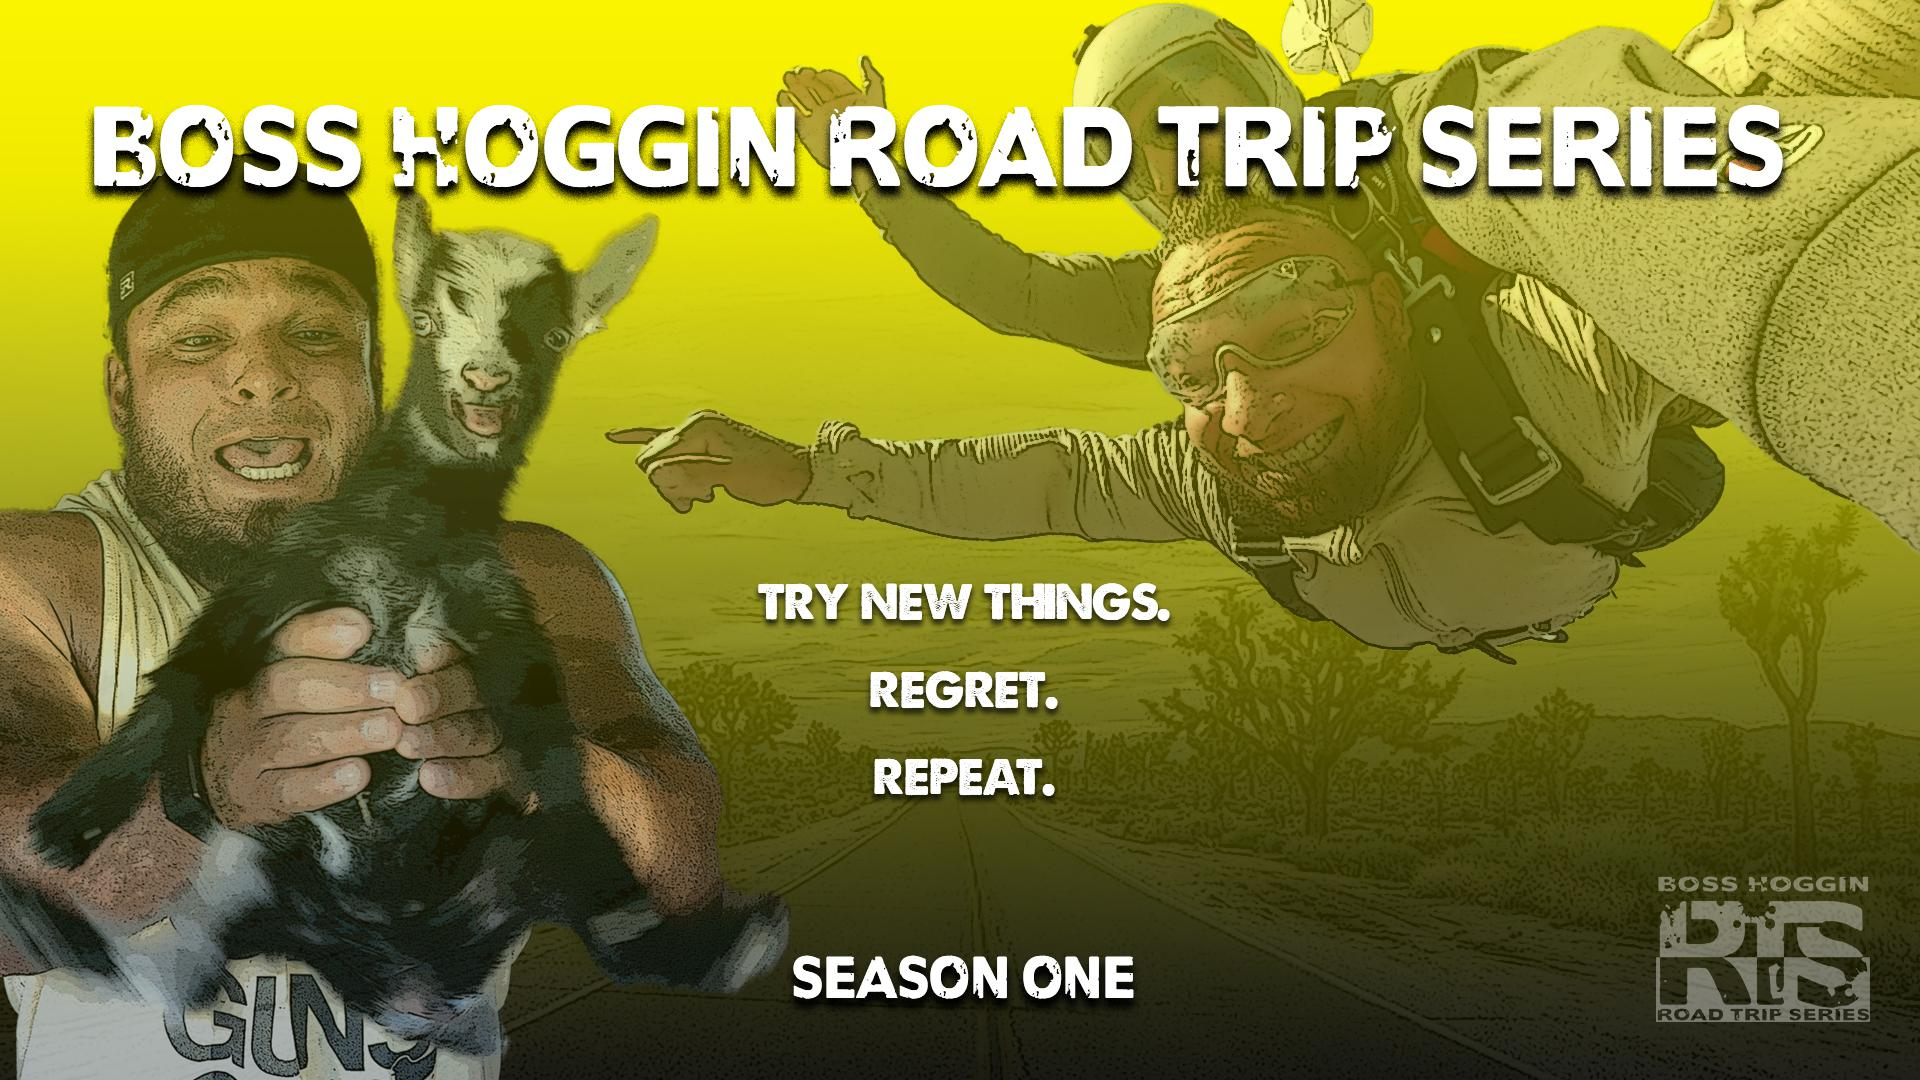 Boss Hoggin Road Trip Series